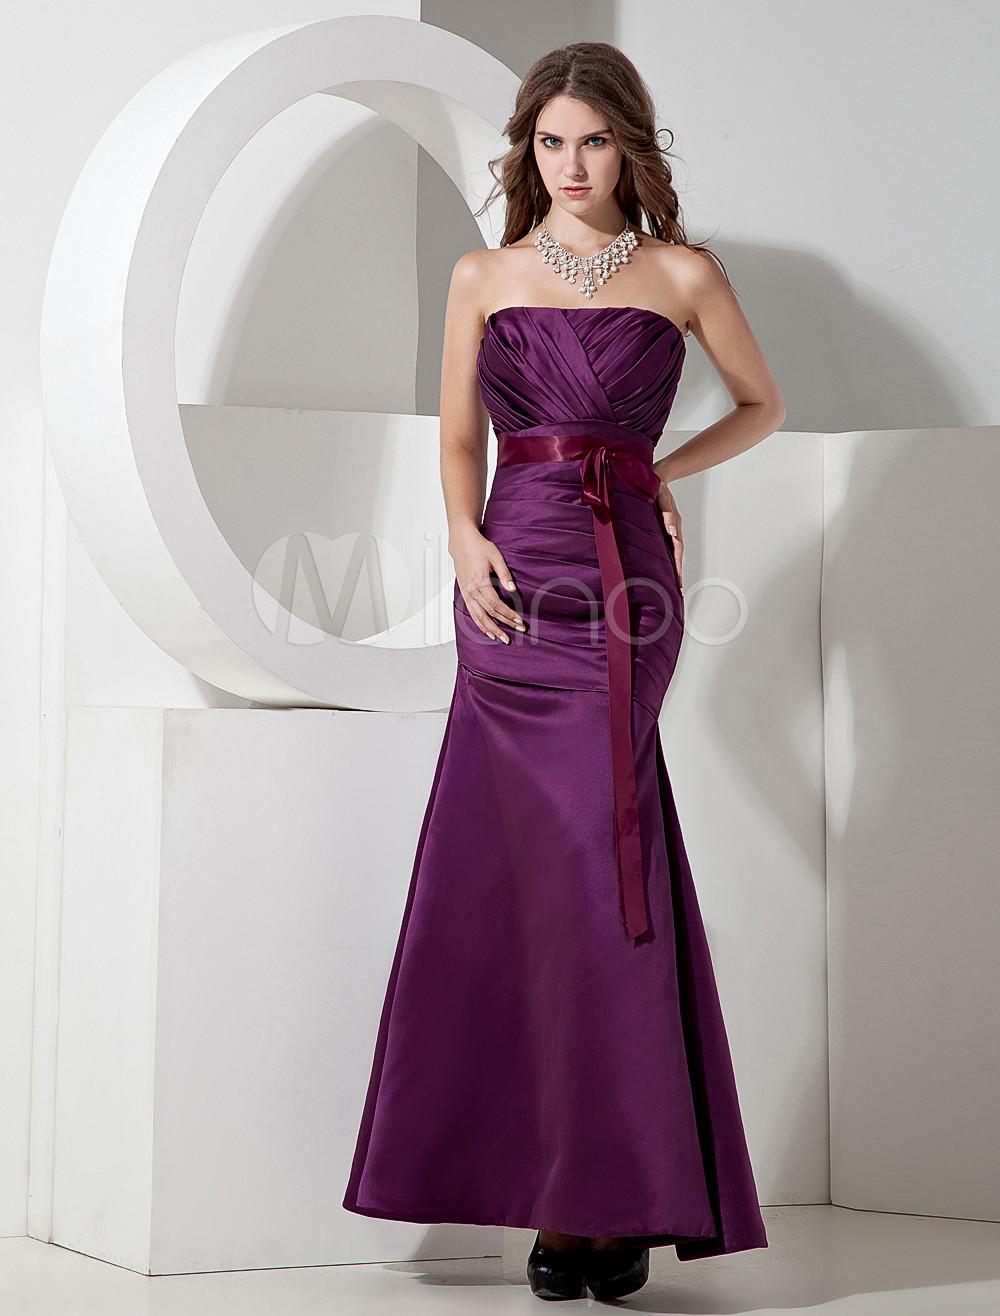 A-line Grape Satin Strapless Floor Length Bridesmaid Dress